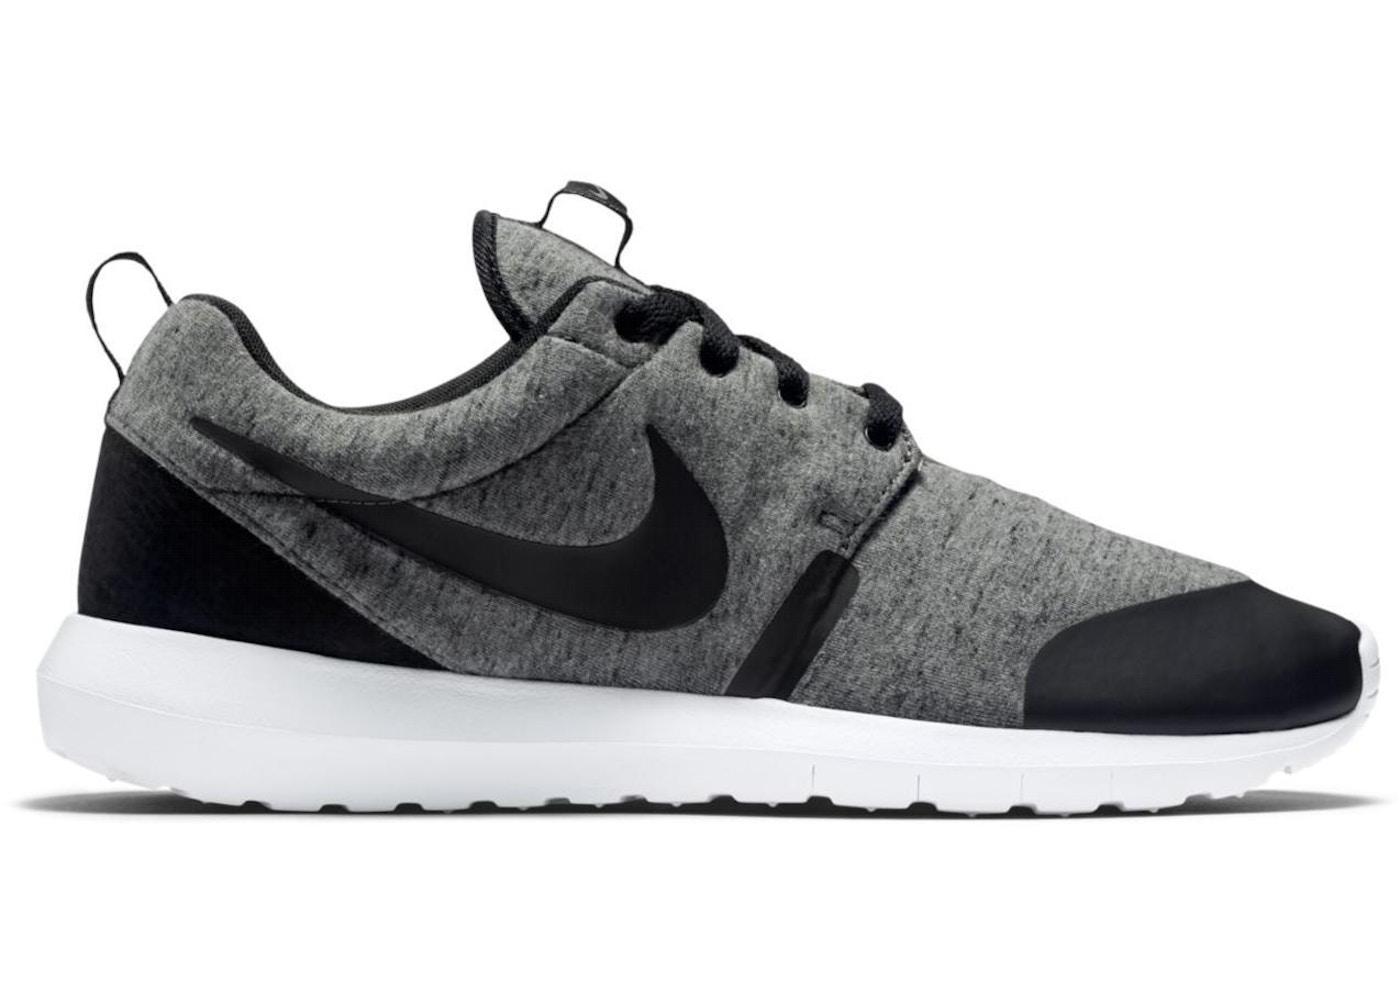 quality design e201f aa537 Nike Roshe Run Tech Fleece Cool Grey